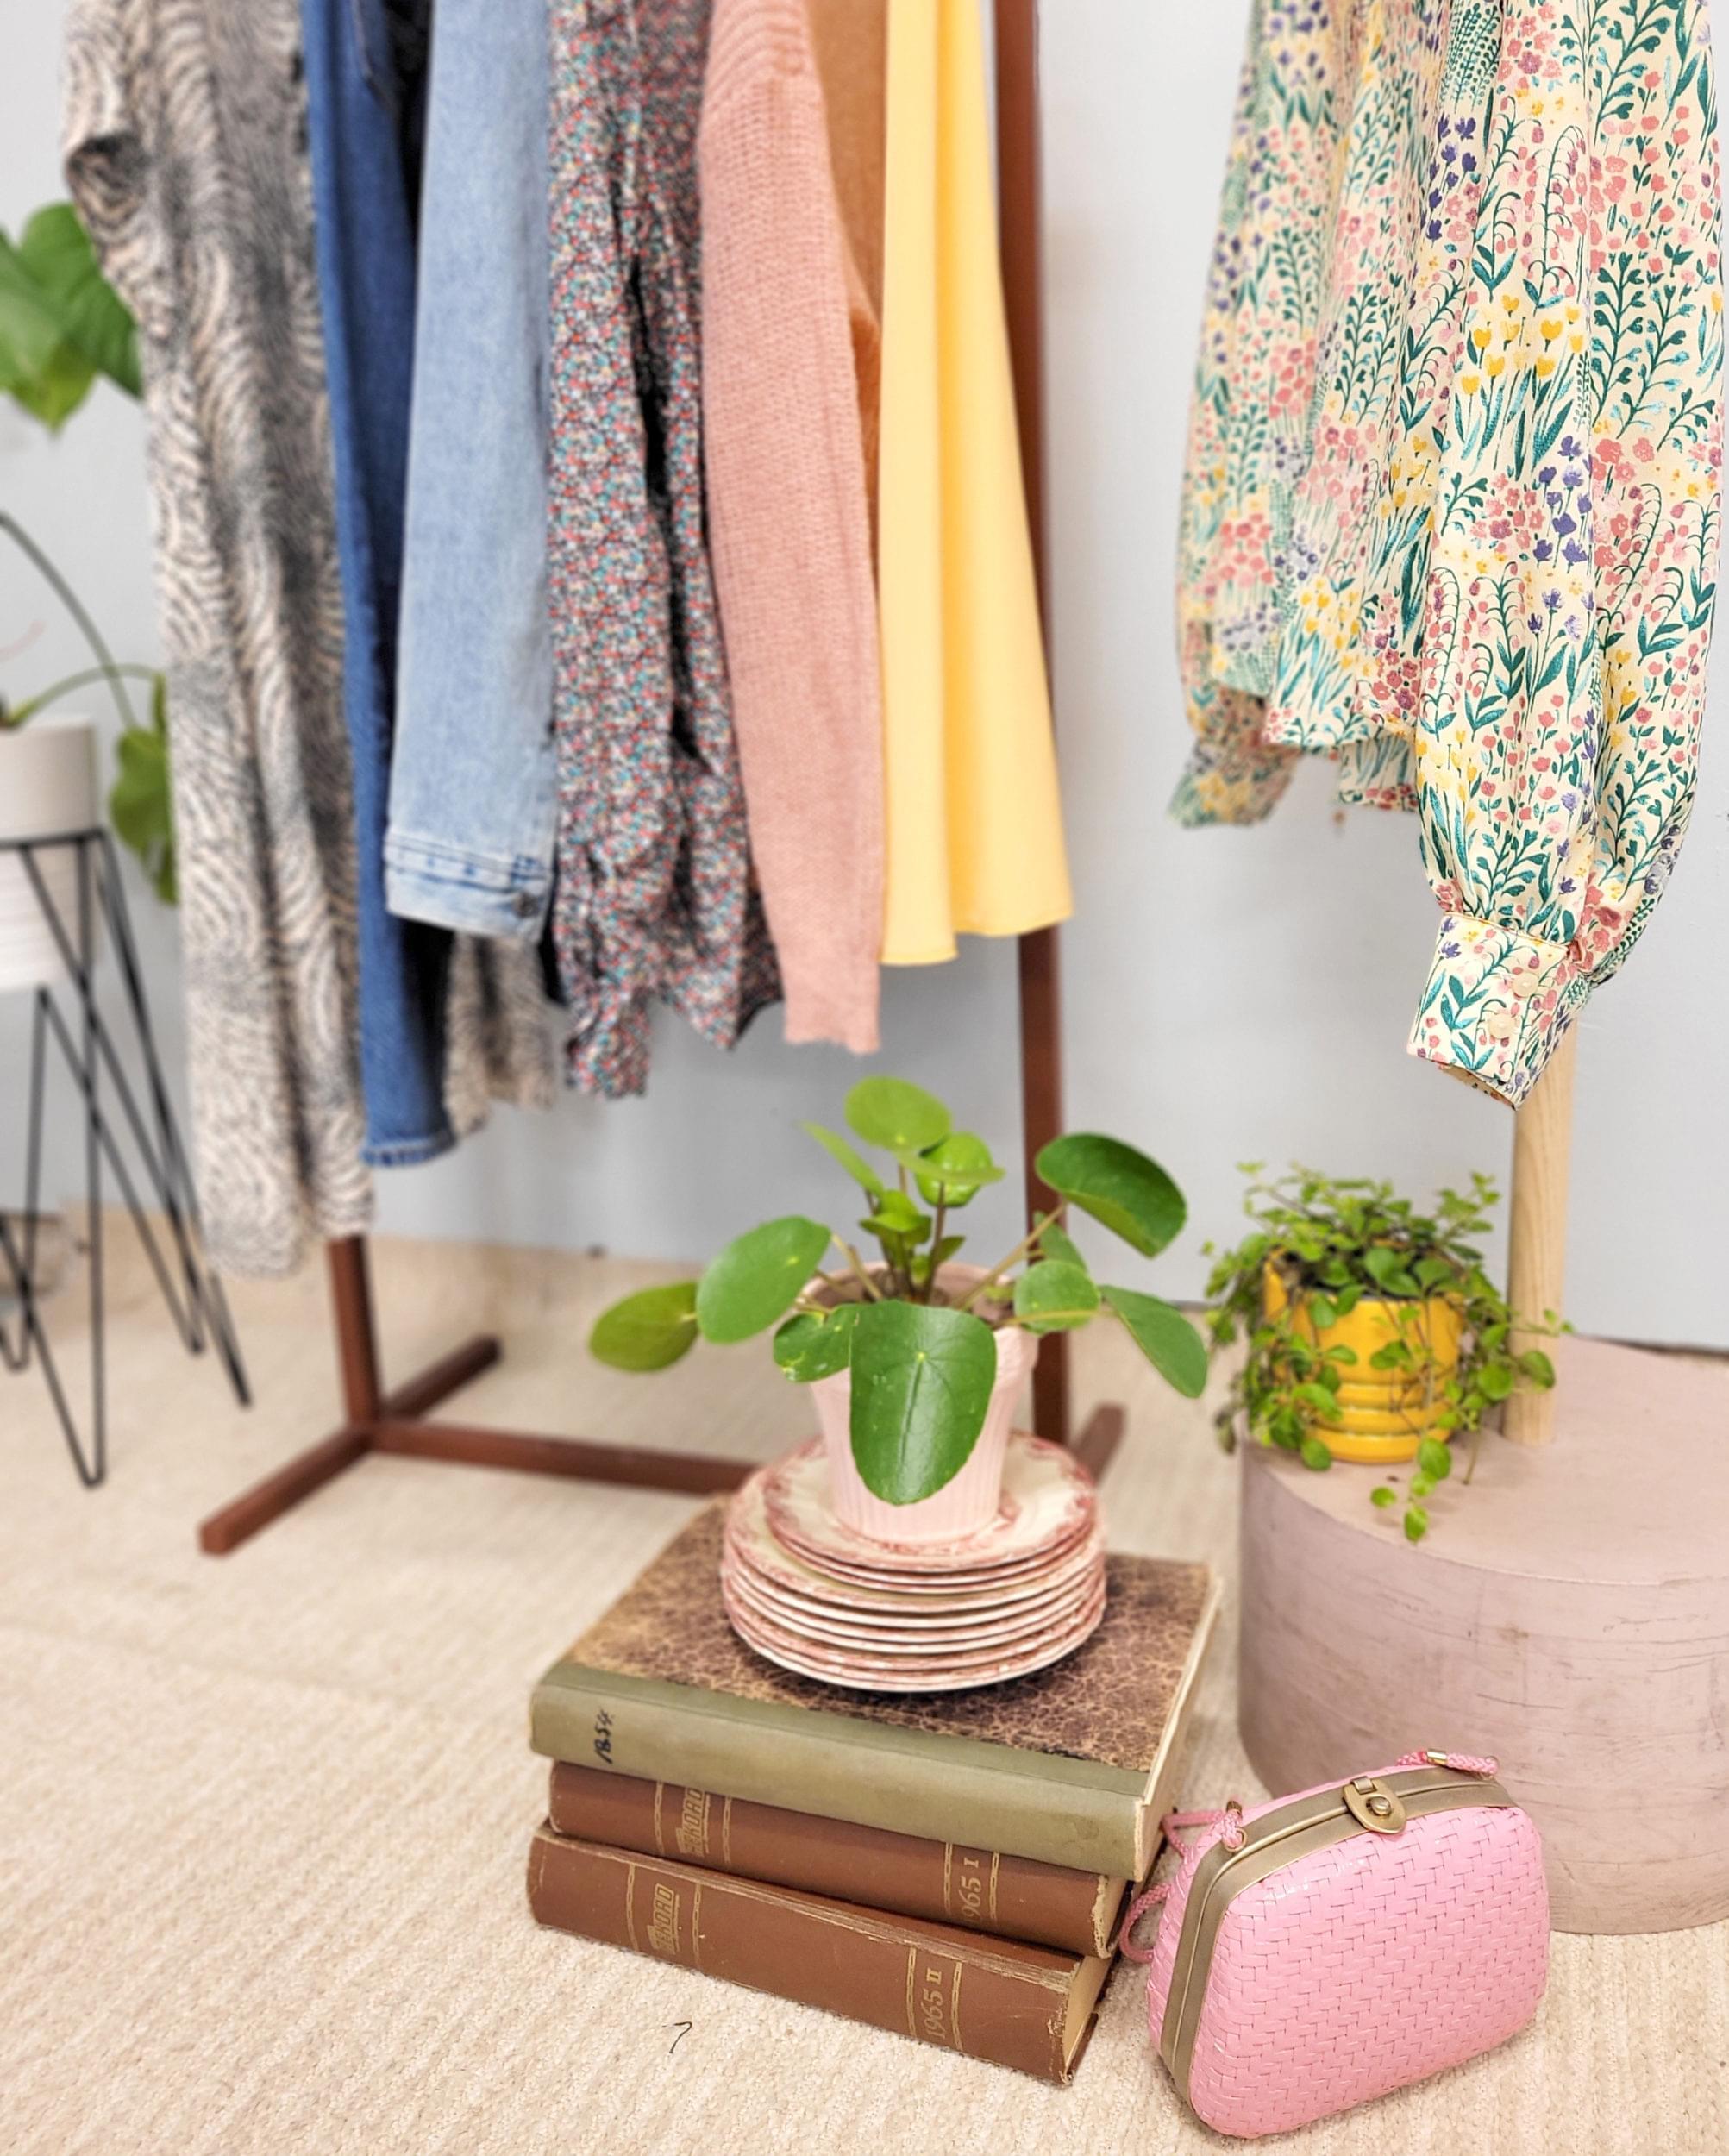 Bild på kläder, accessoarer, böcker